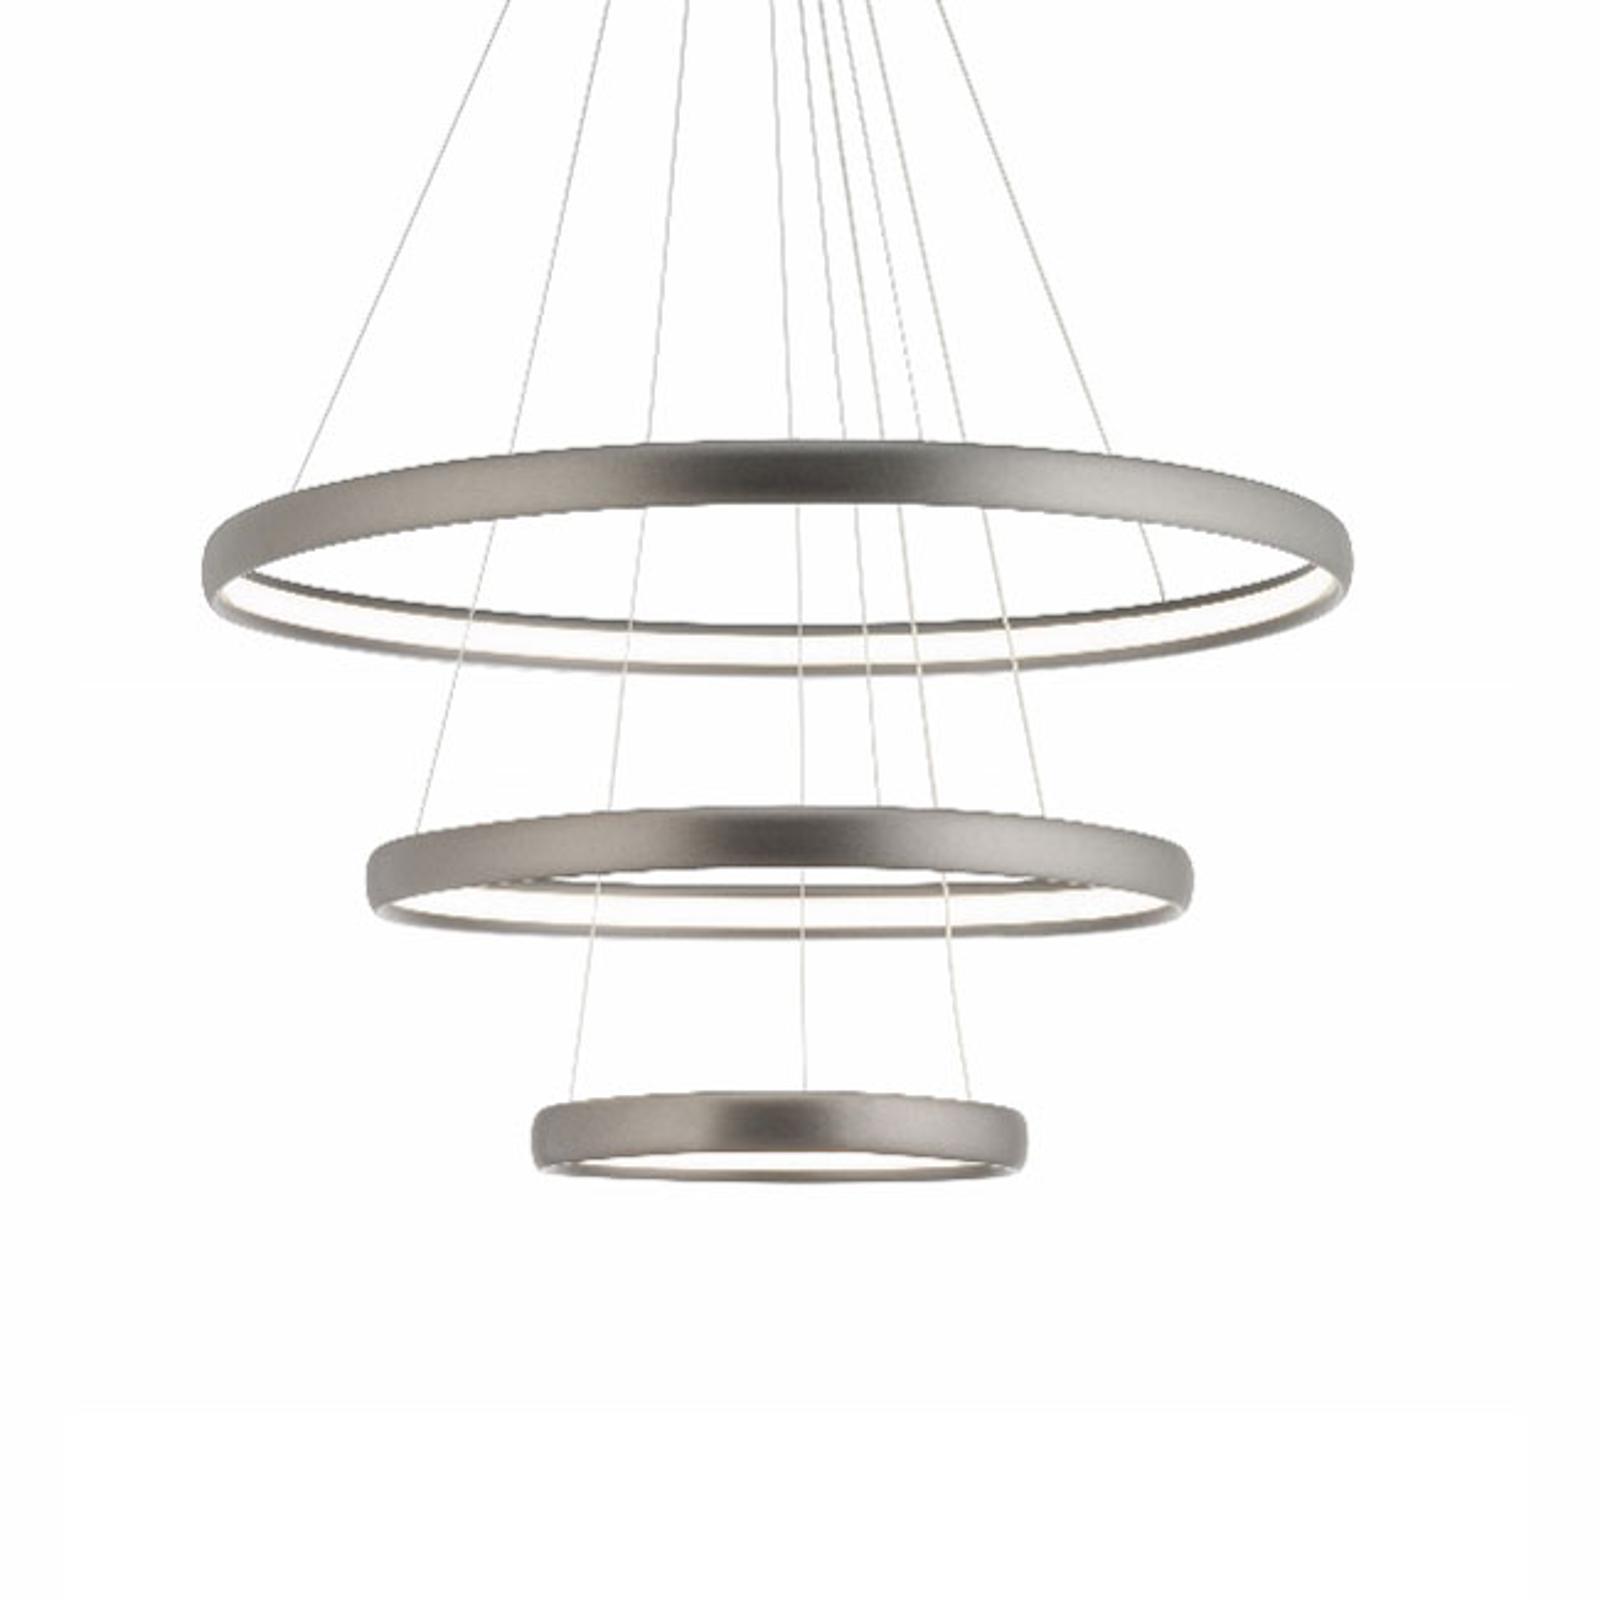 Lampa wisząca LED Trinity z aluminium, srebrna